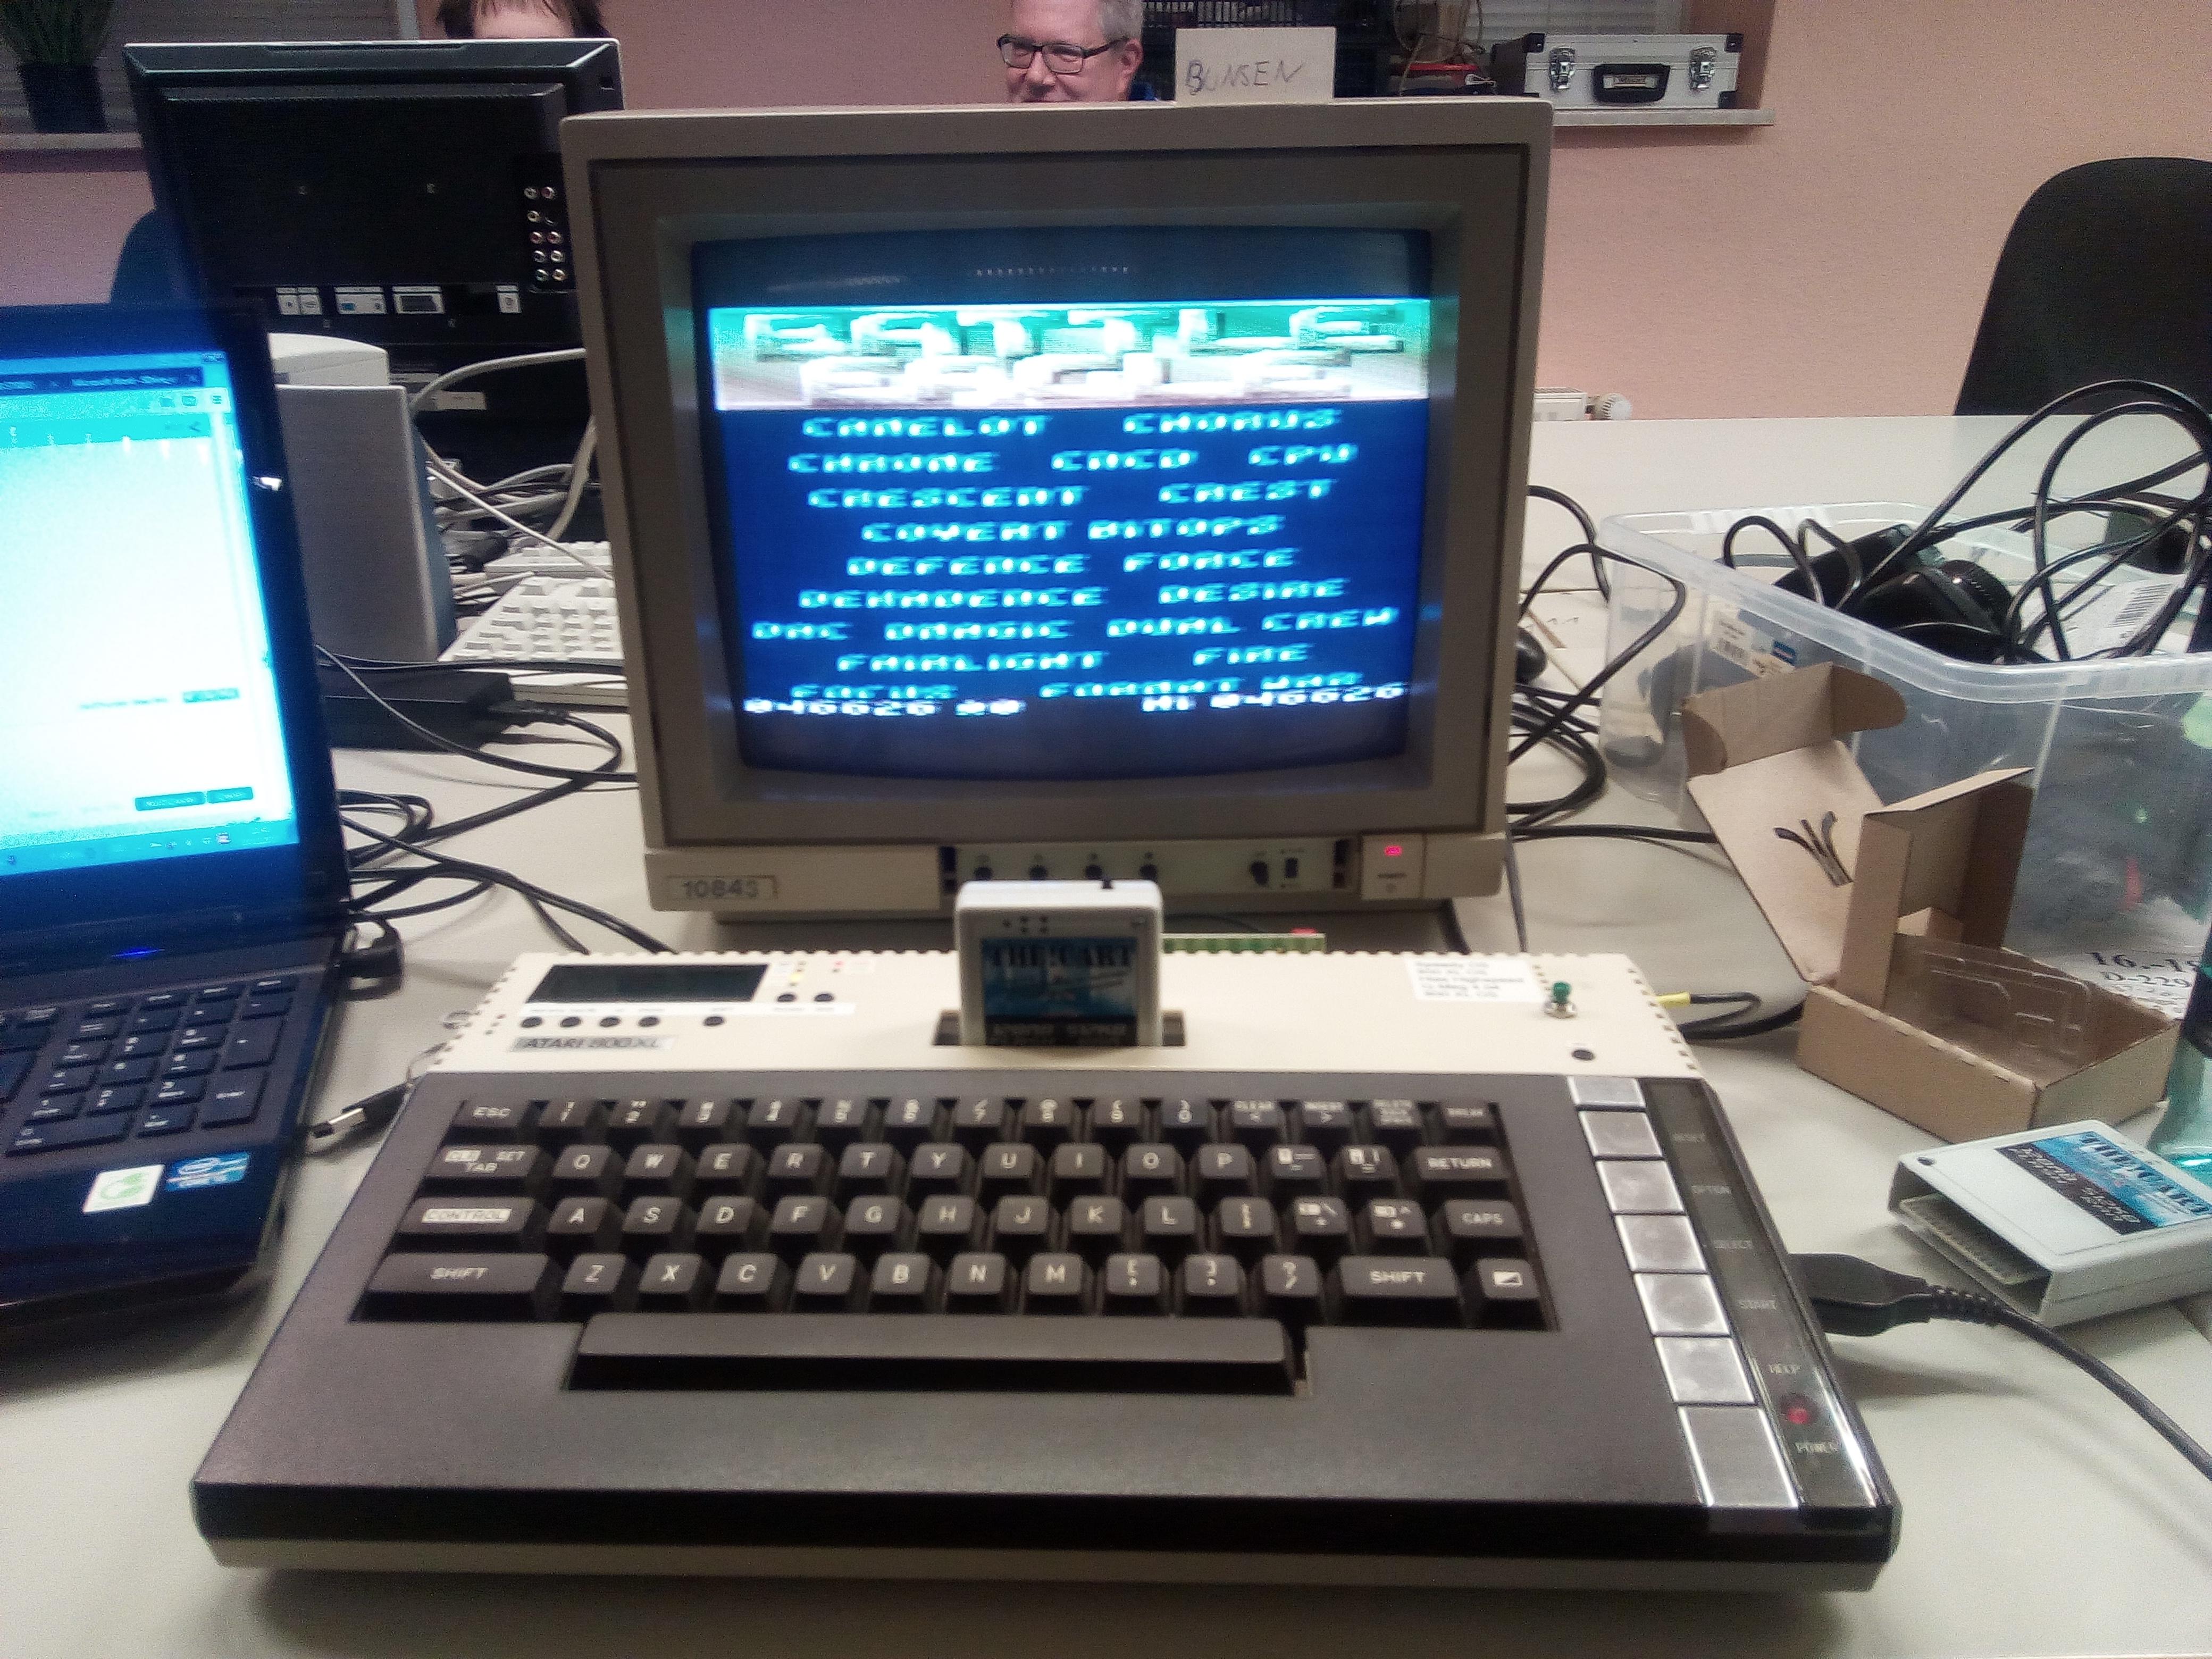 Bunsen: Battle Eagle (Atari 400/800/XL/XE) 46,626 points on 2017-12-09 14:44:25